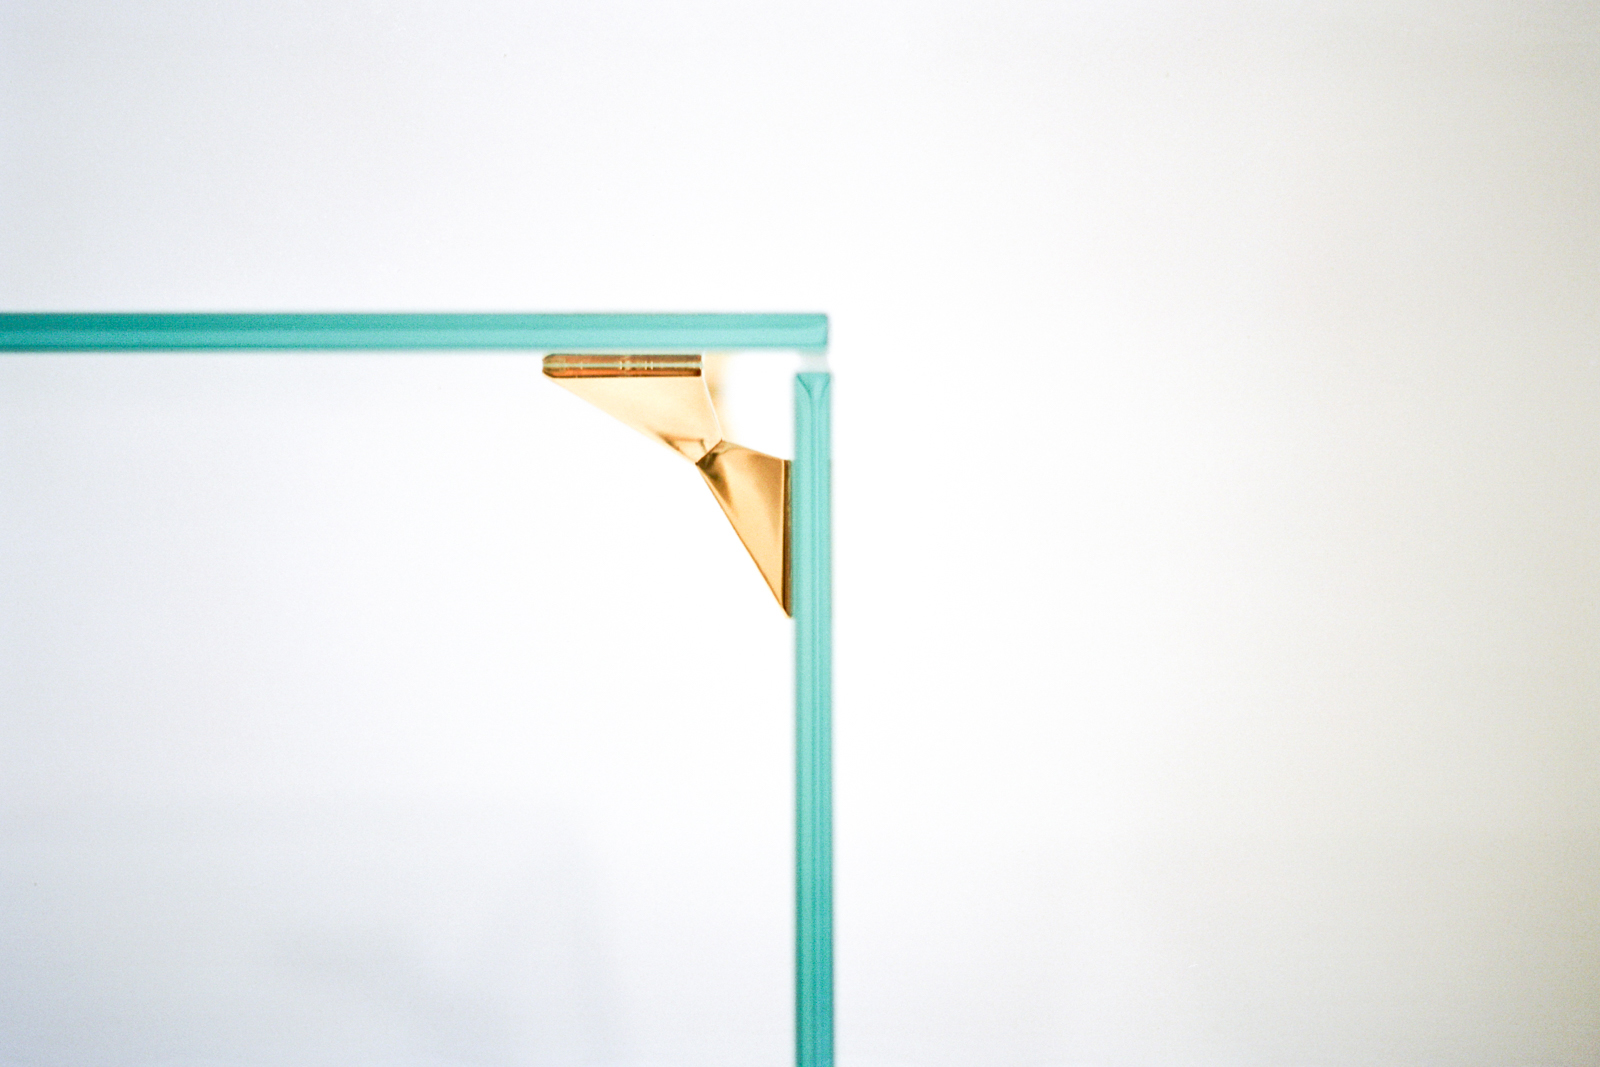 durodeco_Bow Tie Table (4).jpg